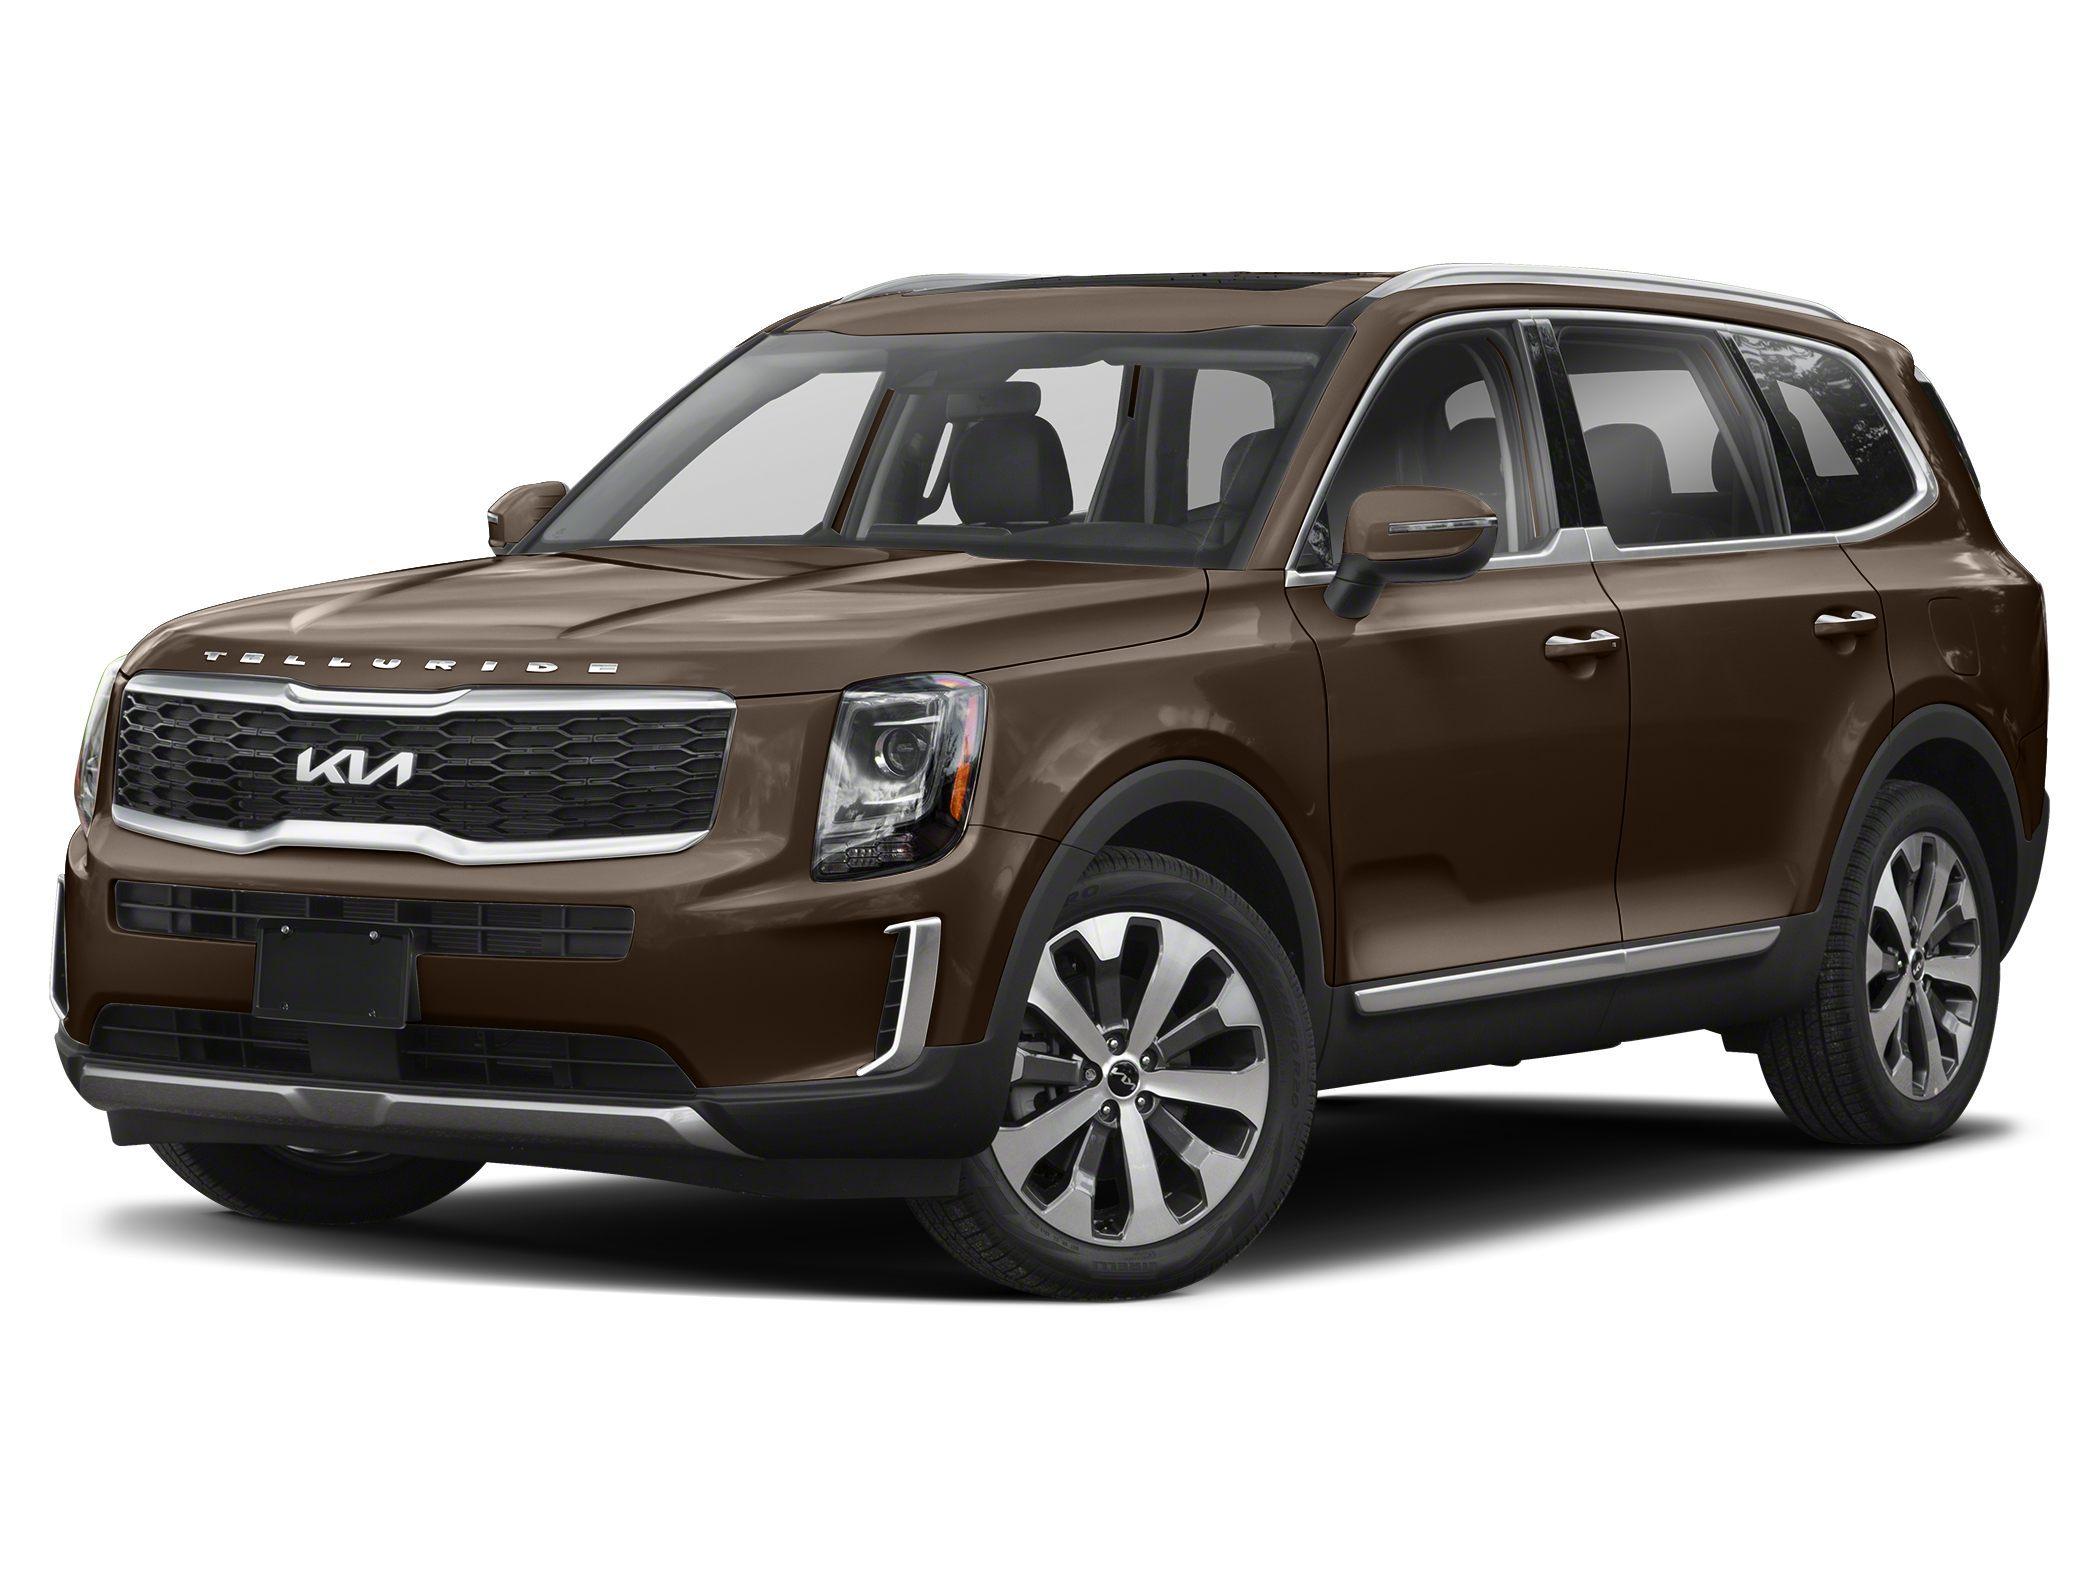 2022 Kia Telluride SUV